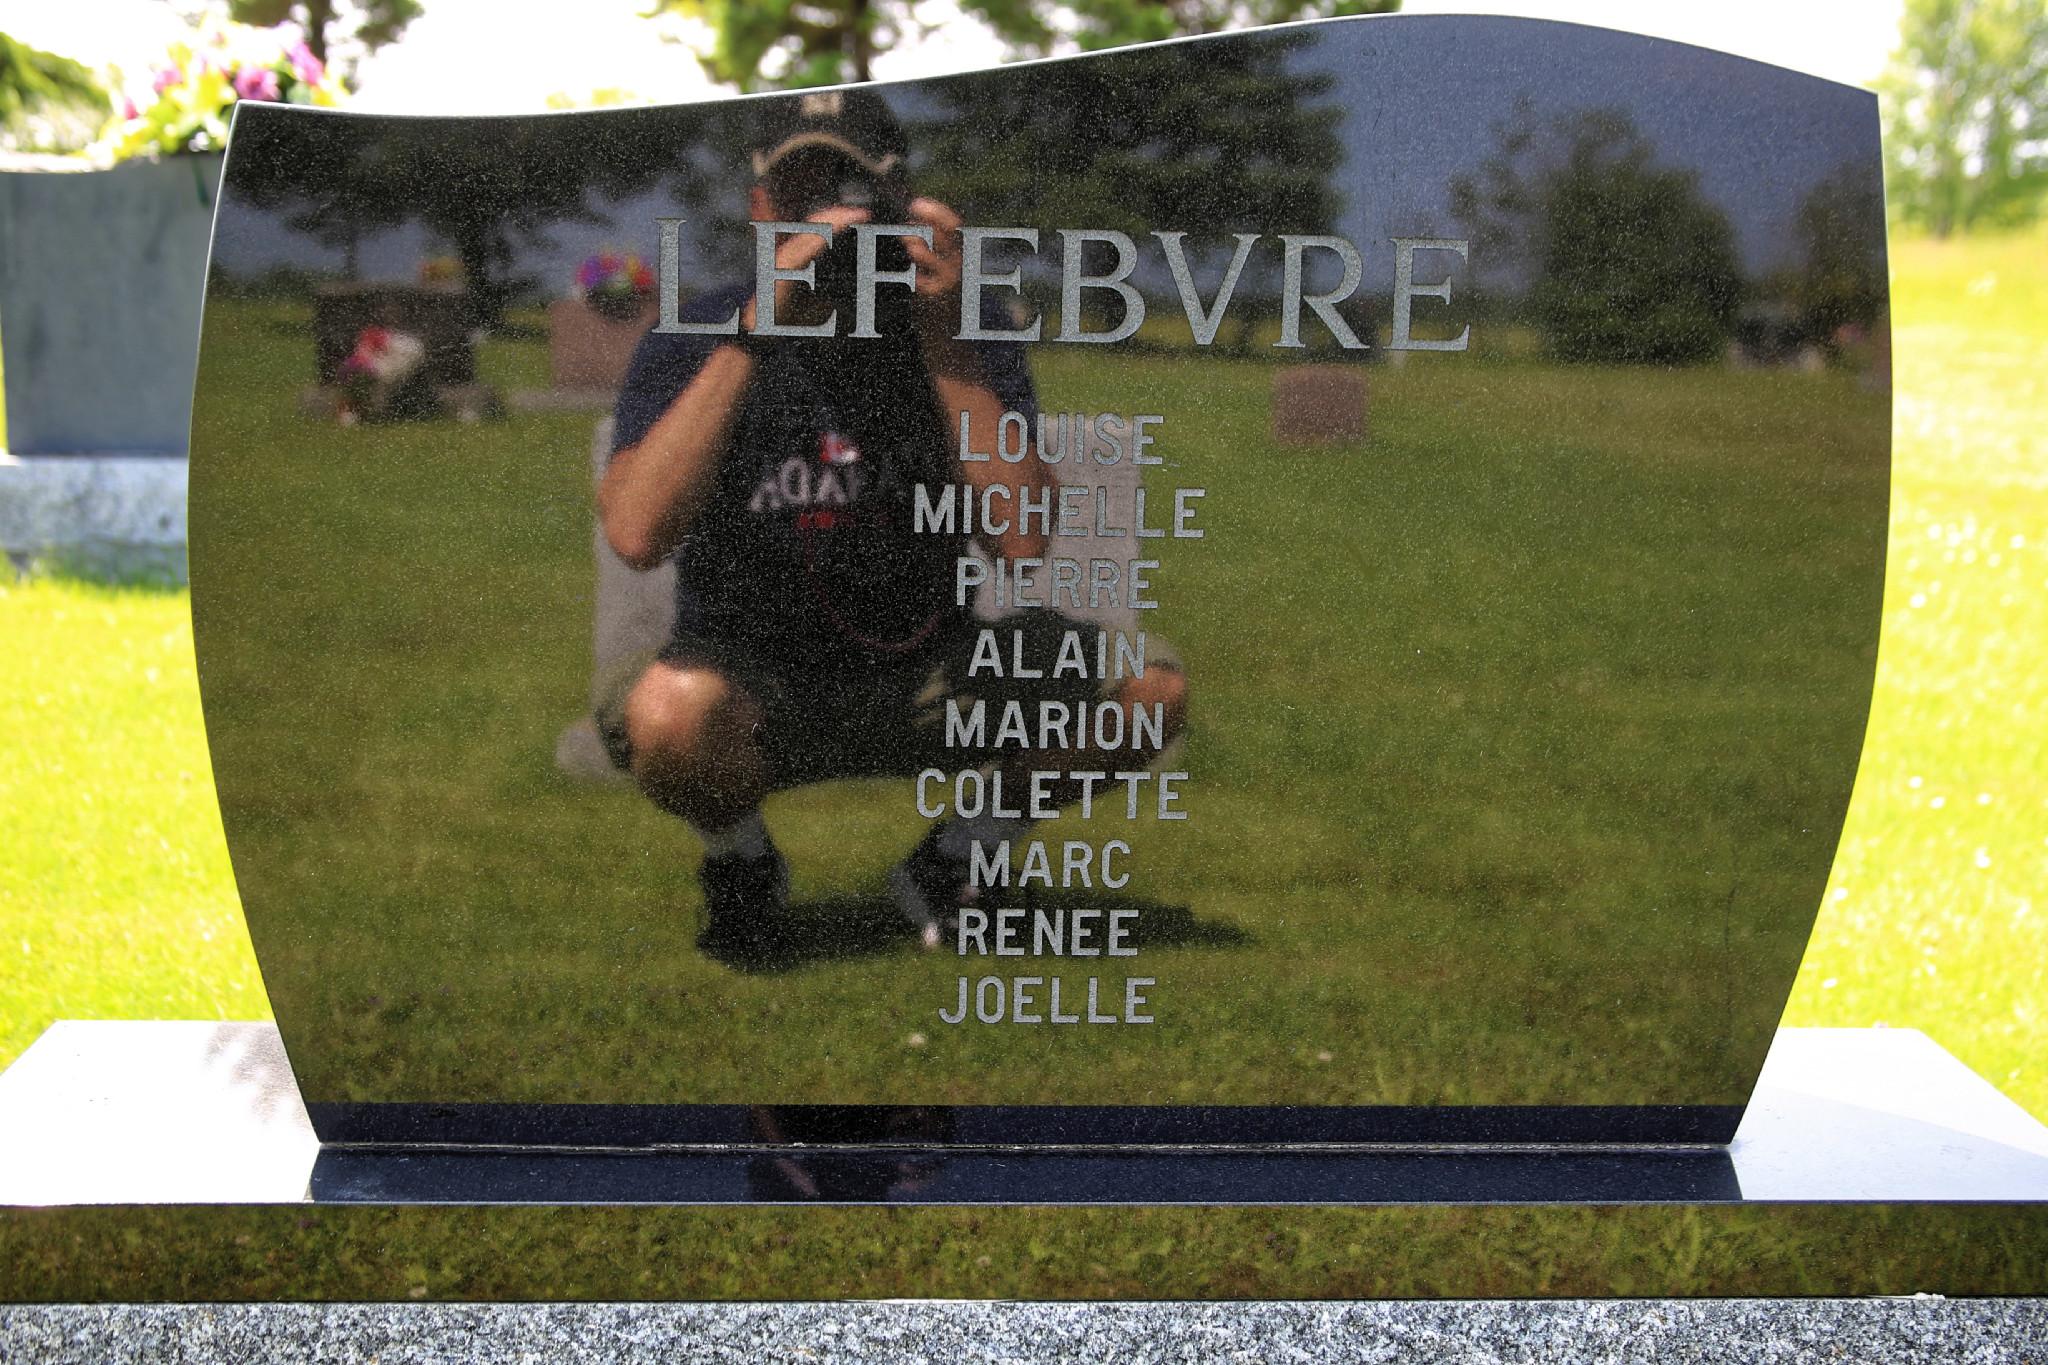 Jean-Marie Lefebvre